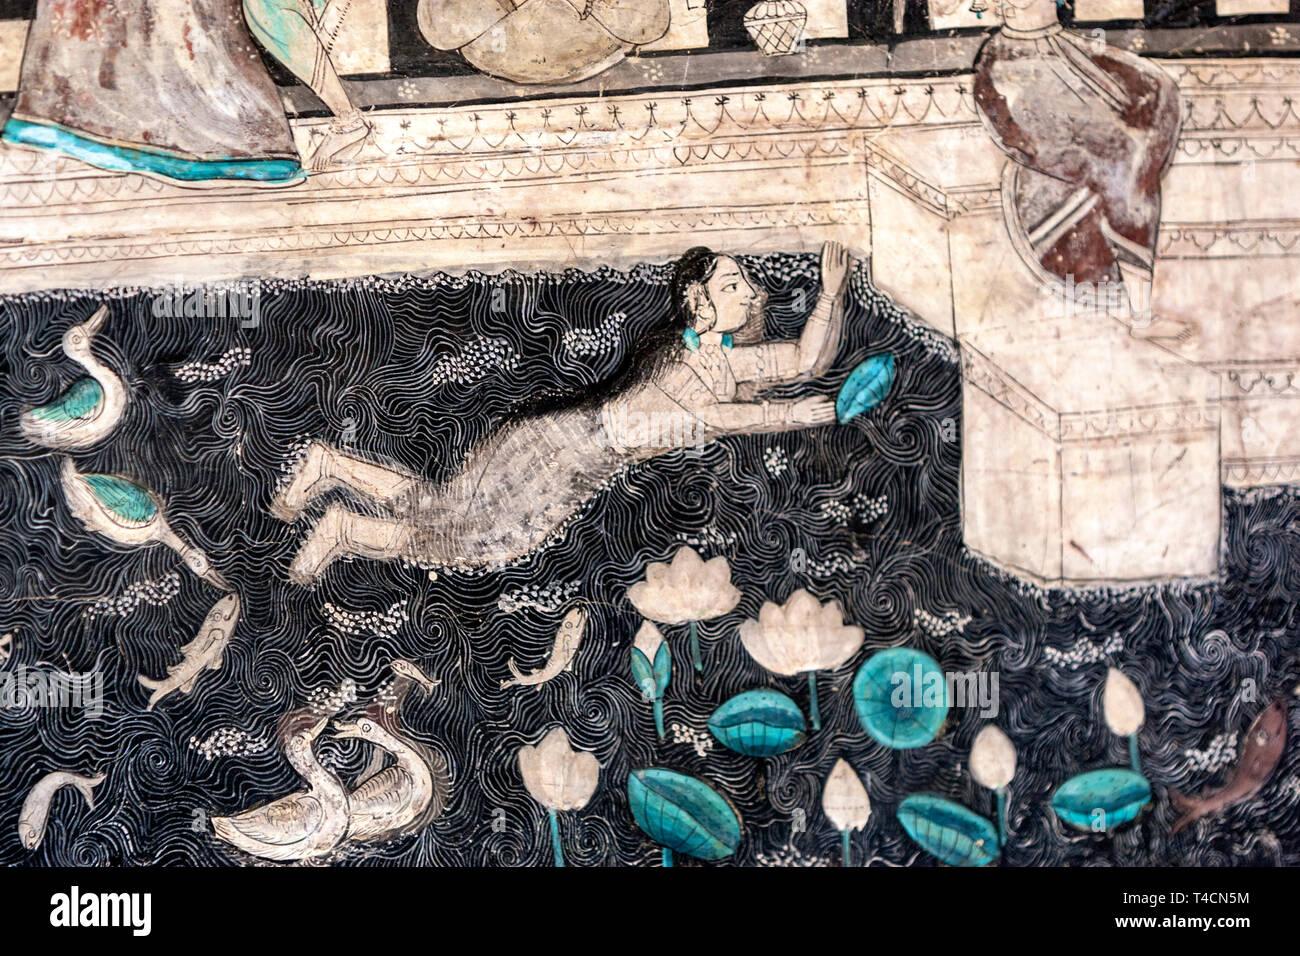 Wall Paintings in west veranda, Chitra Mahal, Bundi Palace, Bundi, Rajasthan, India - Stock Image